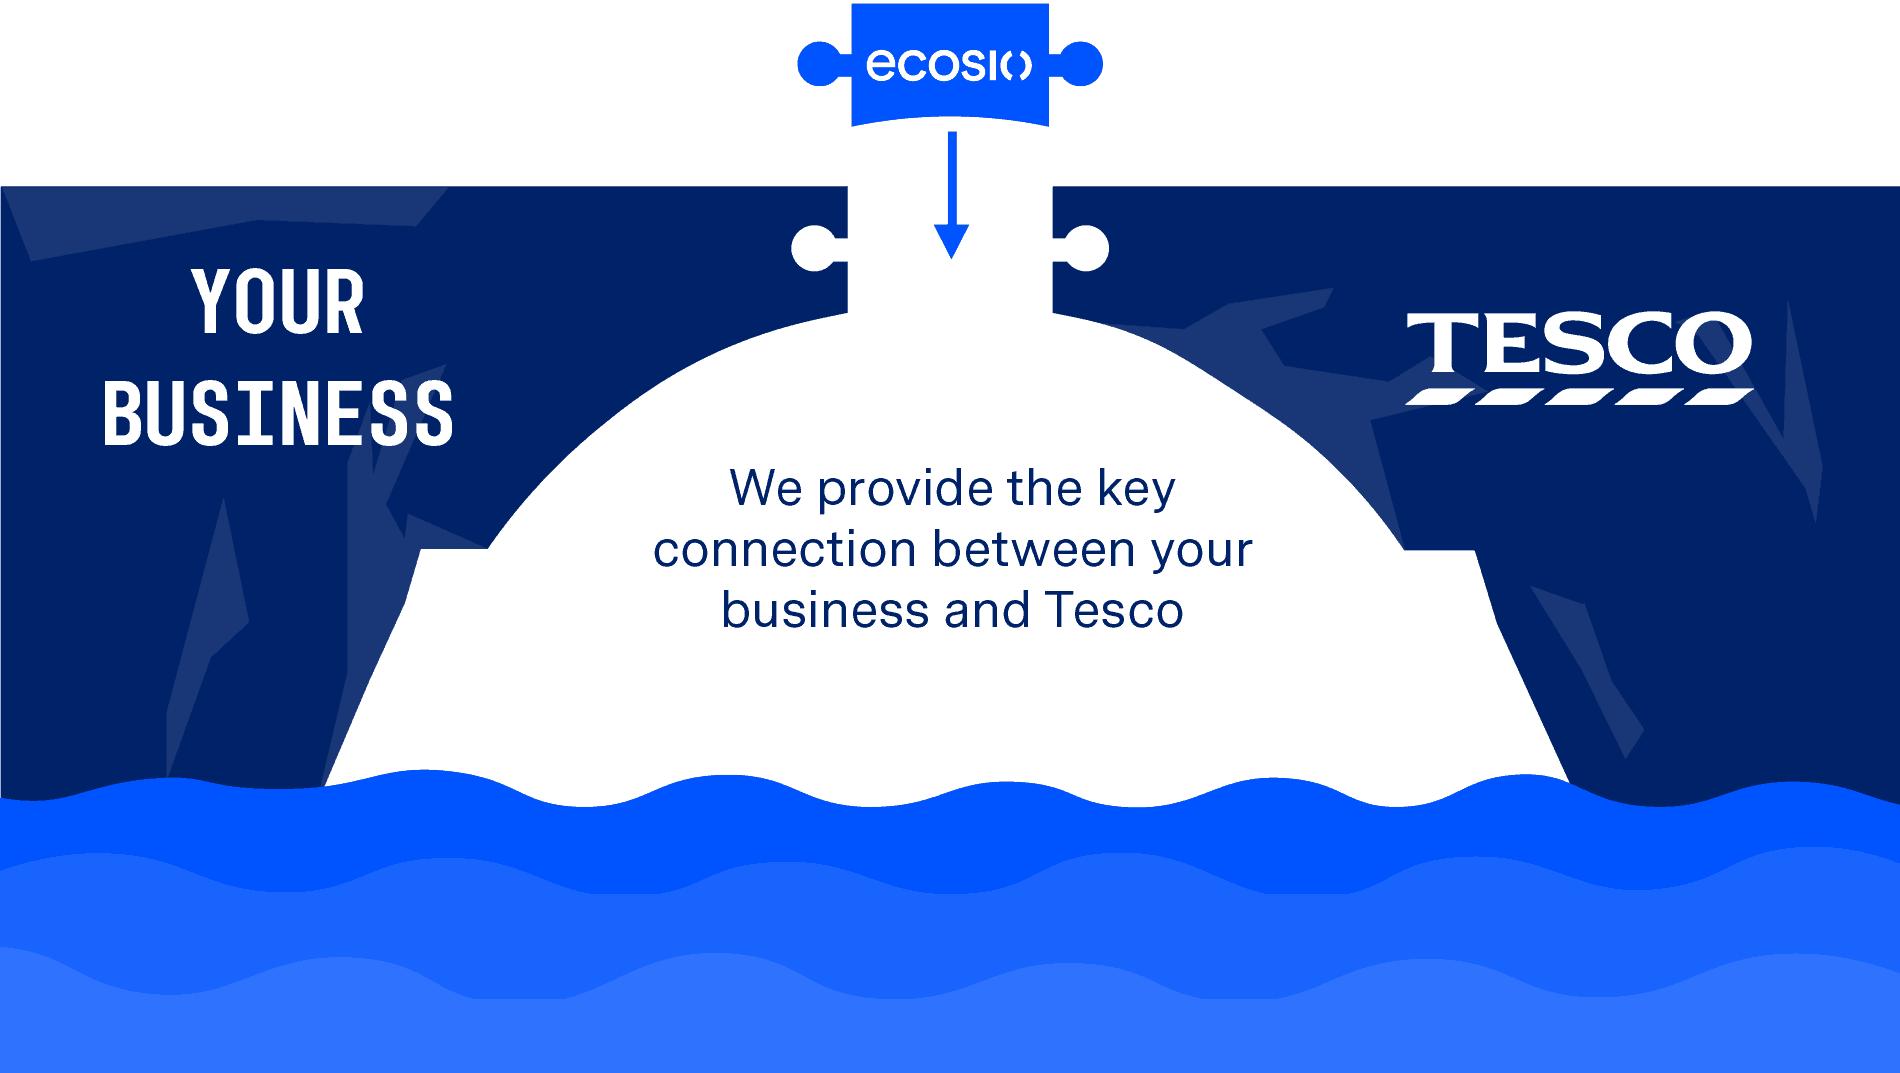 Tesco EDI Partner Connection Bridge